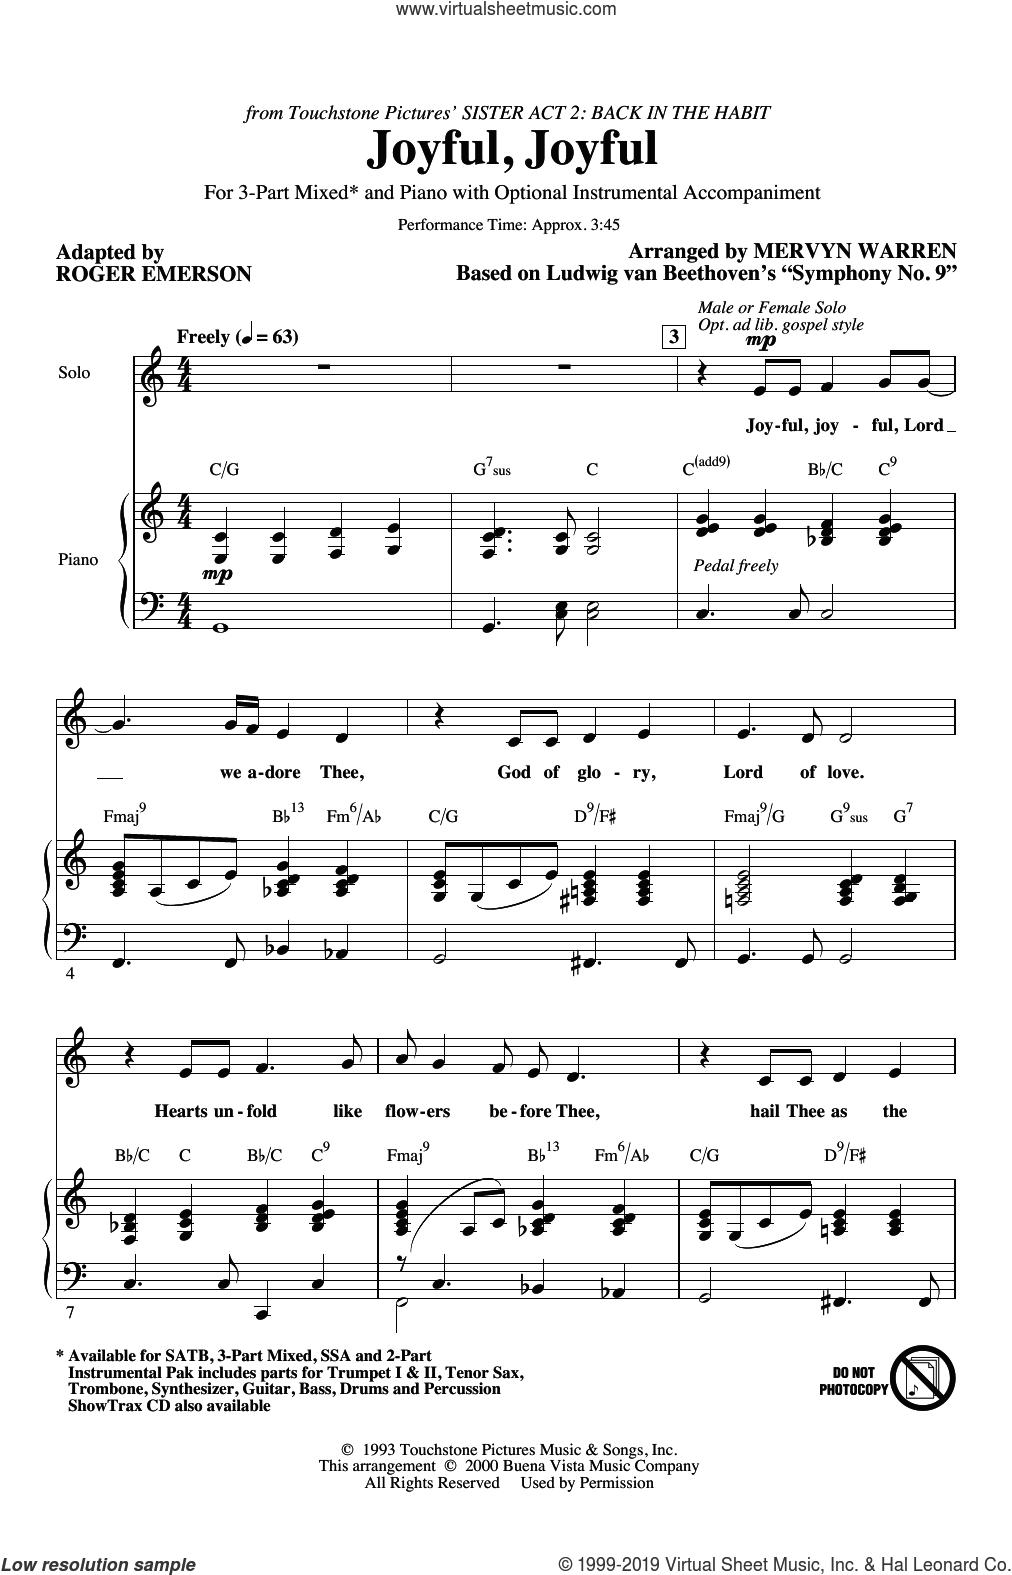 Joyful, Joyful (from Sister Act 2) (arr. Roger Emerson) sheet music for choir (3-Part Mixed) by Mervyn Warren, Roger Emerson and Ludwig van Beethoven, intermediate skill level